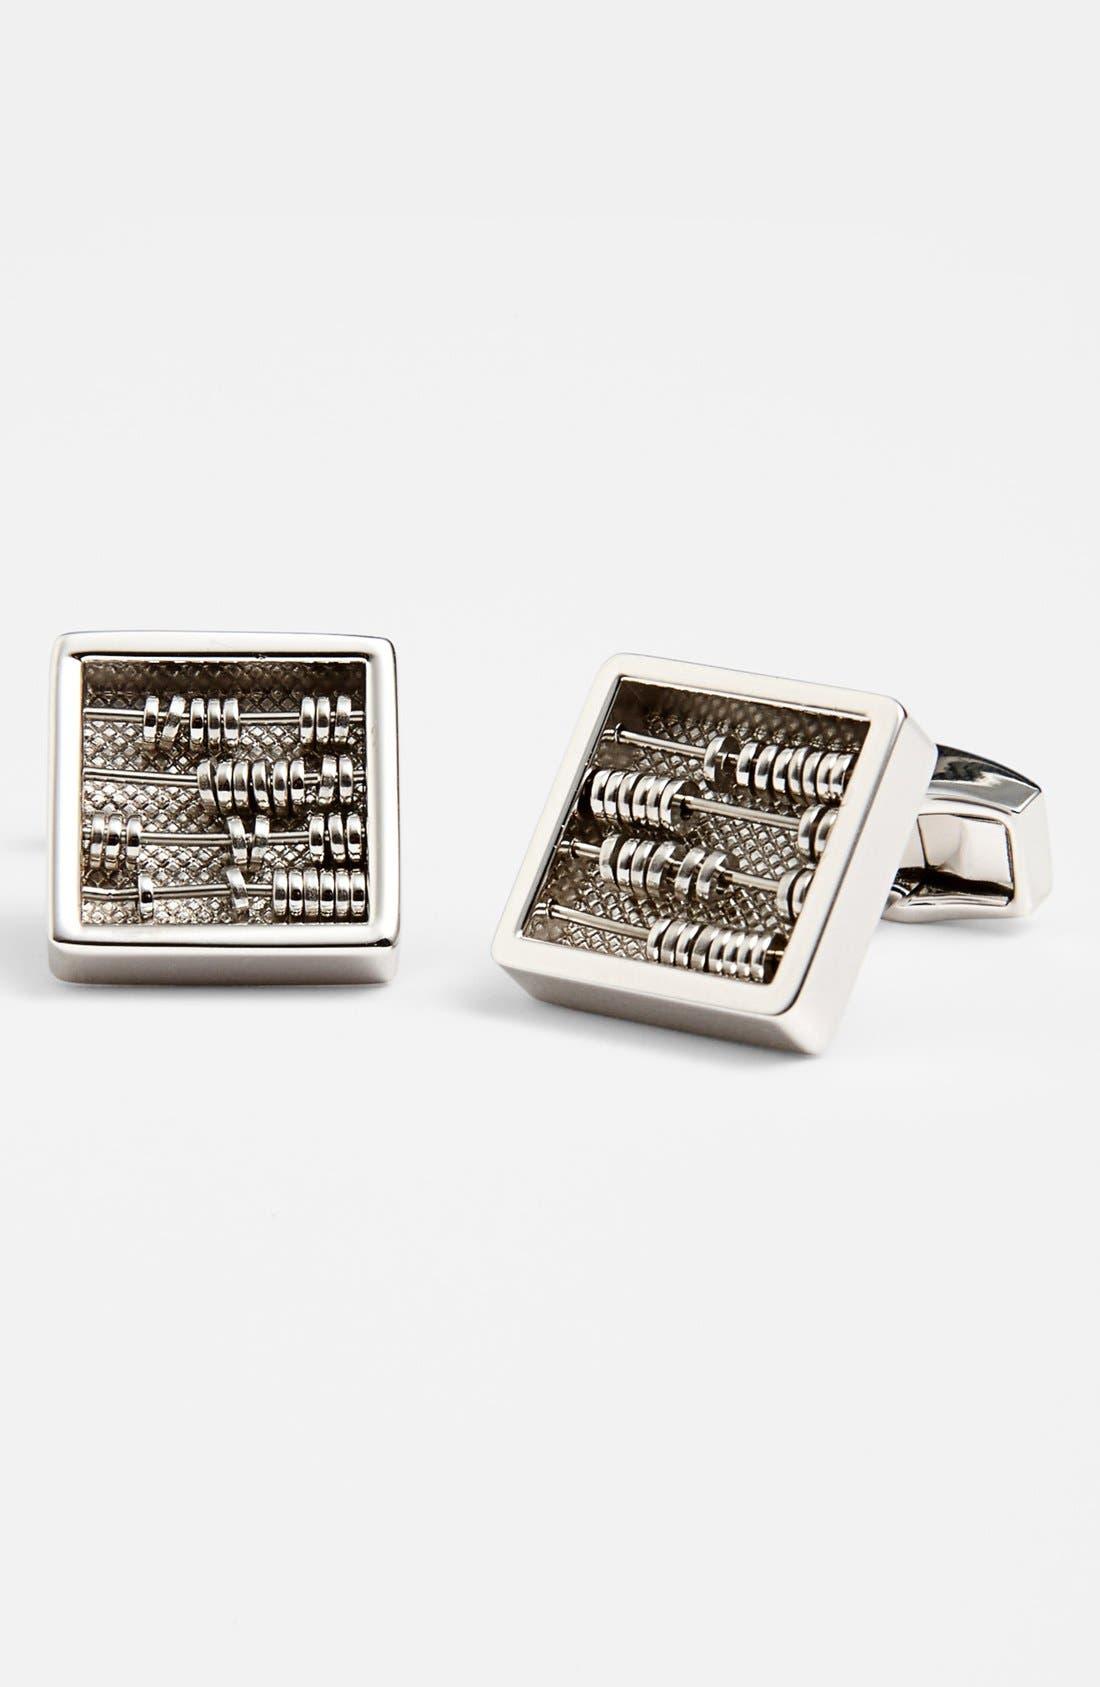 Alternate Image 1 Selected - Tateossian Abacus Cuff Links